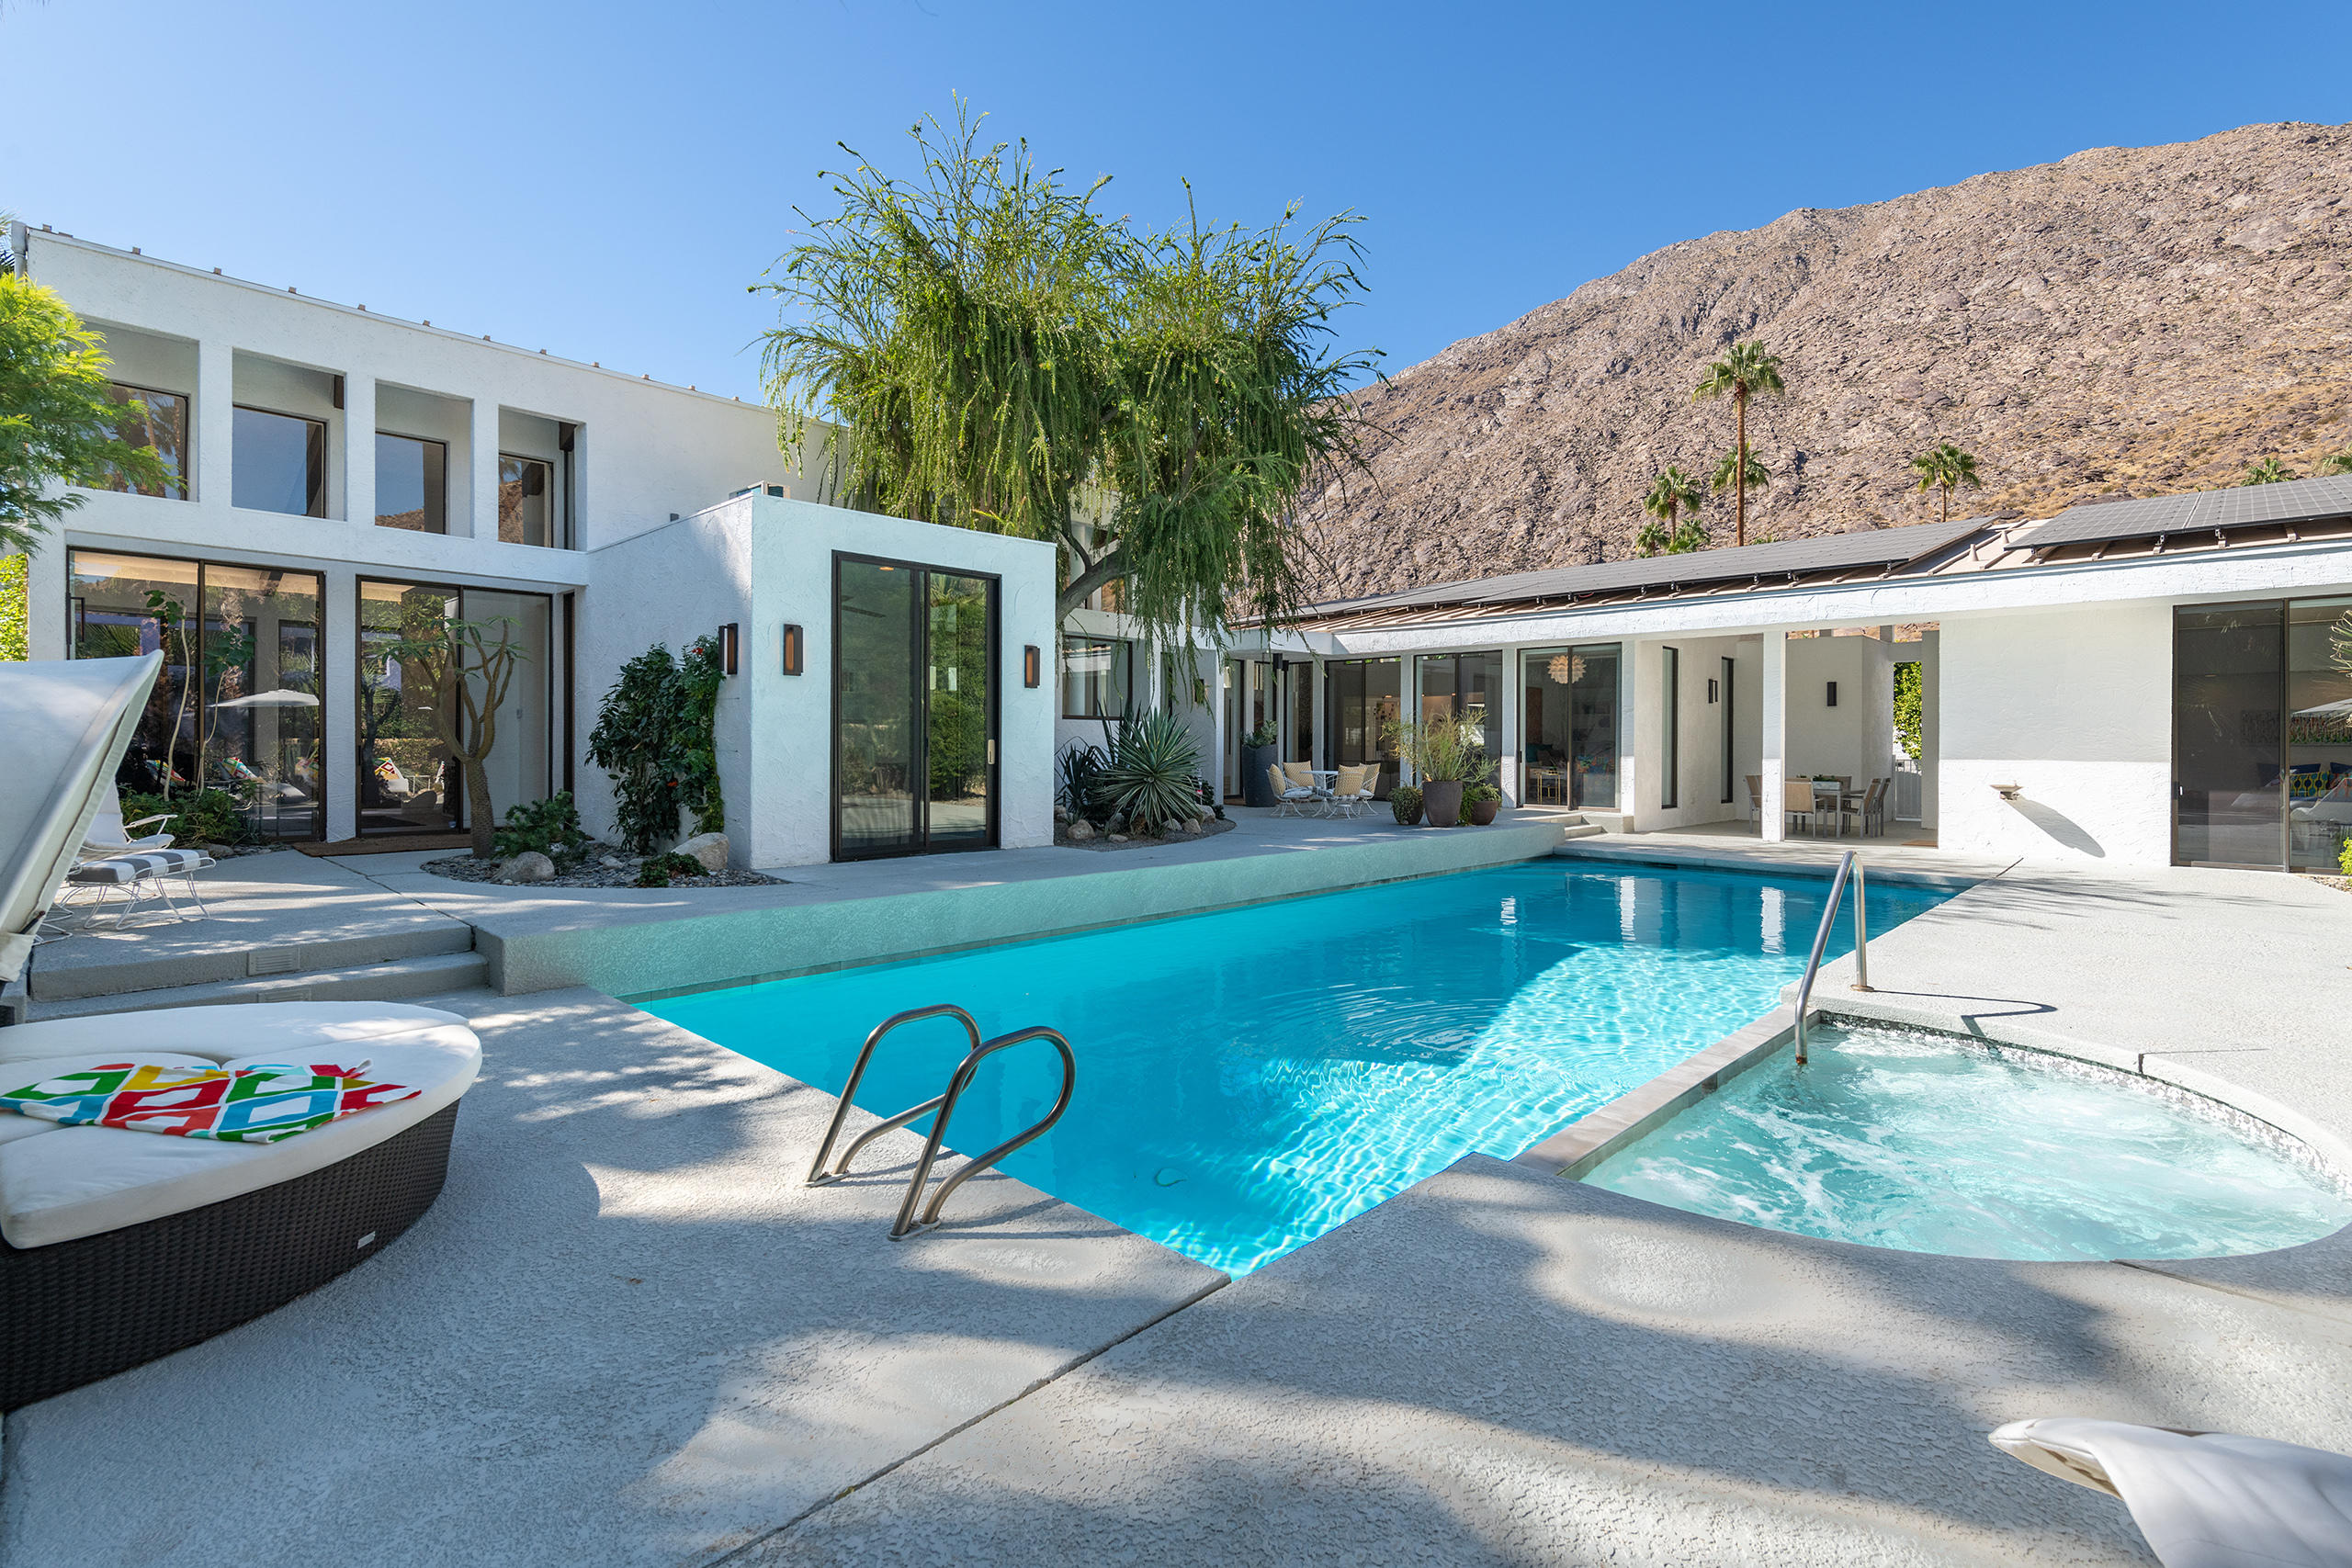 Photo of 550 Santa Rosa Drive, Palm Springs, CA 92262